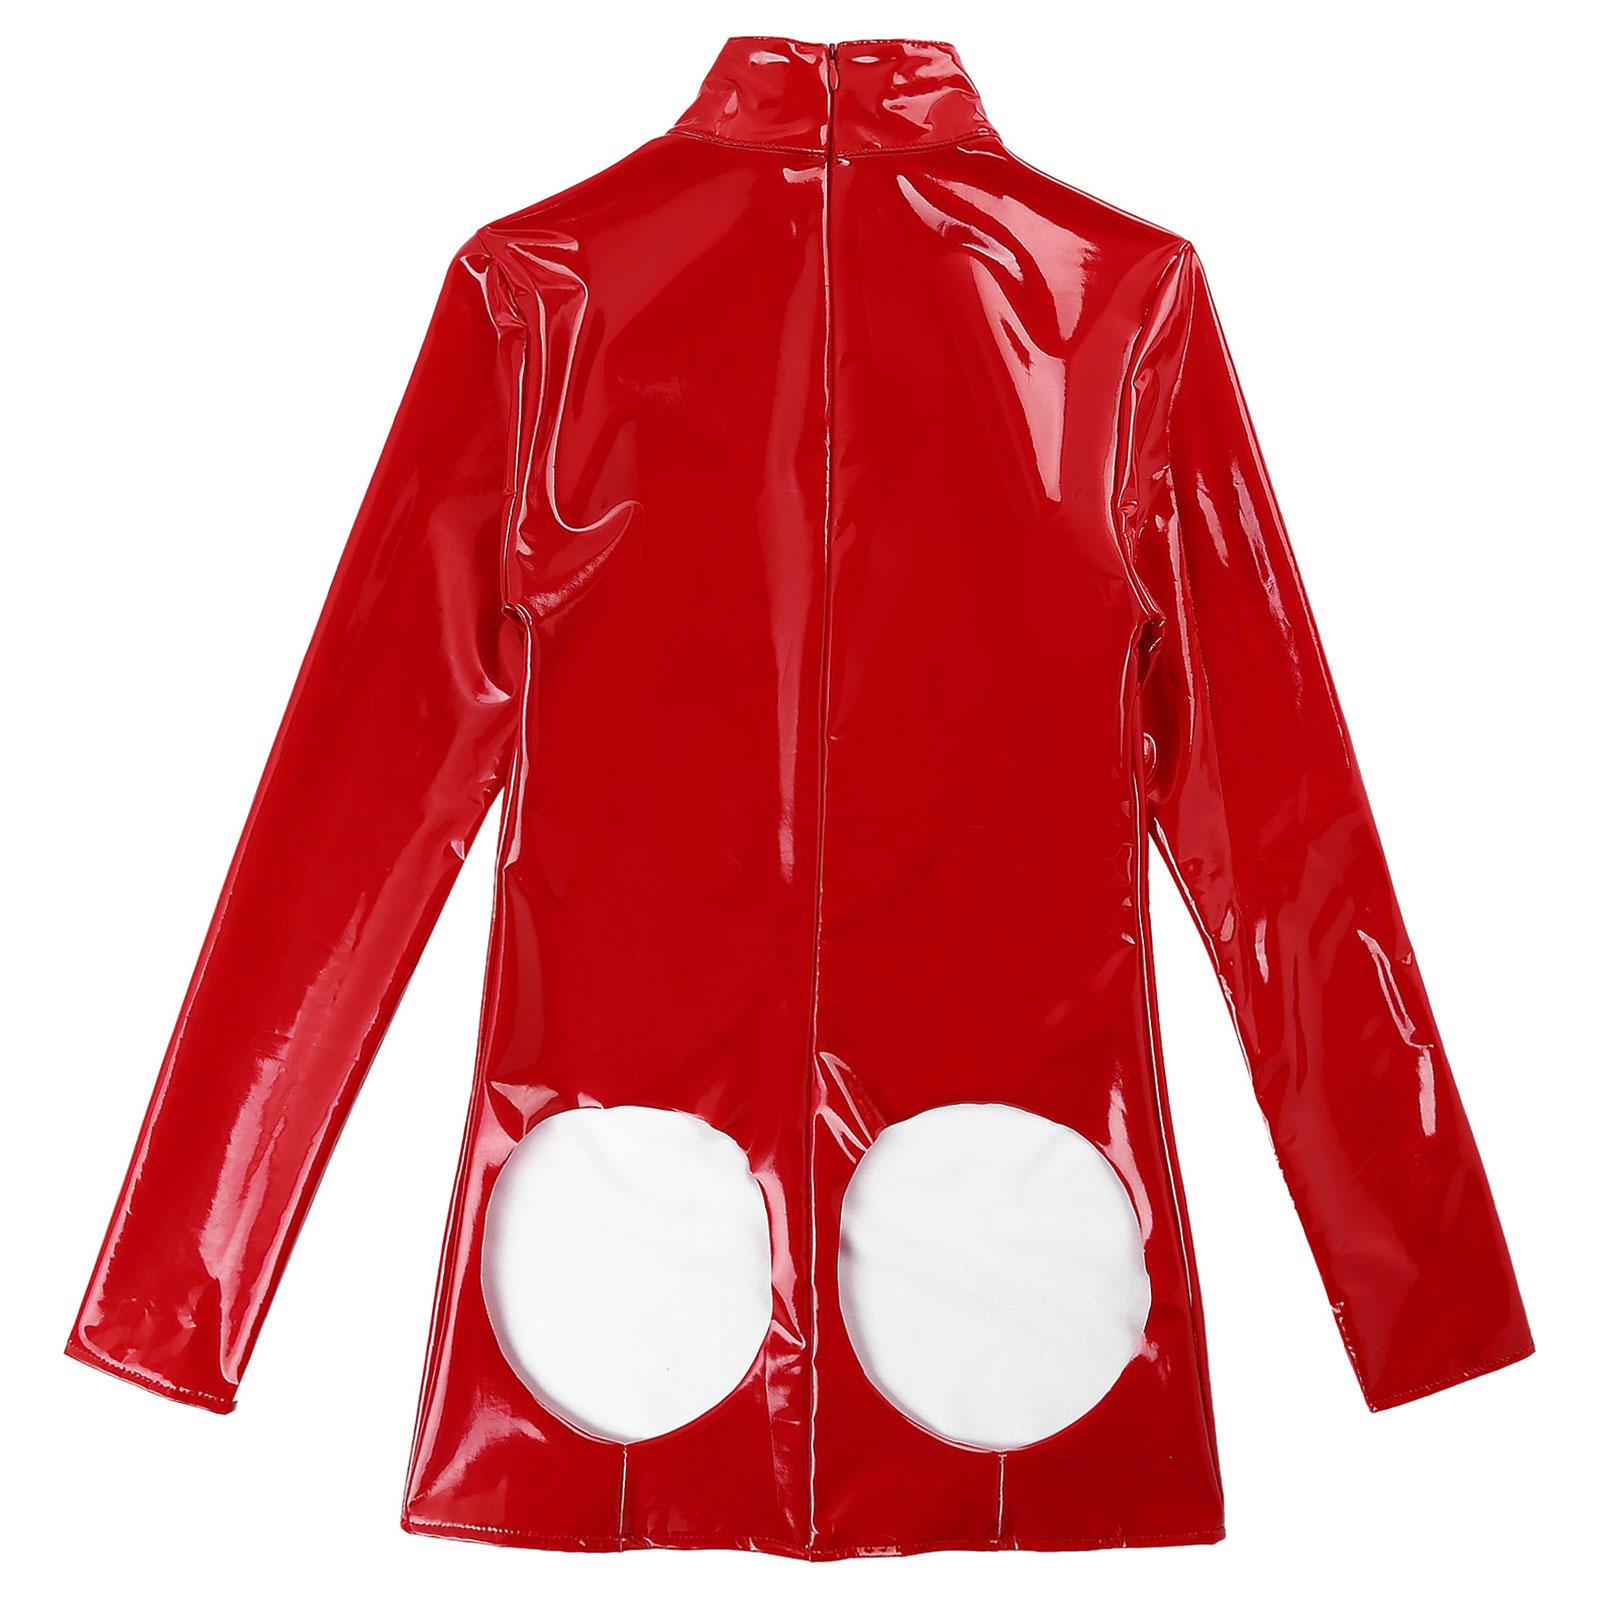 Womens Lingerie Bodysuit Wet-Look Patent Leather Stand Collar Bare Breast Open Cup Open Butt Zipper Mini Dress Ladies Clubwear